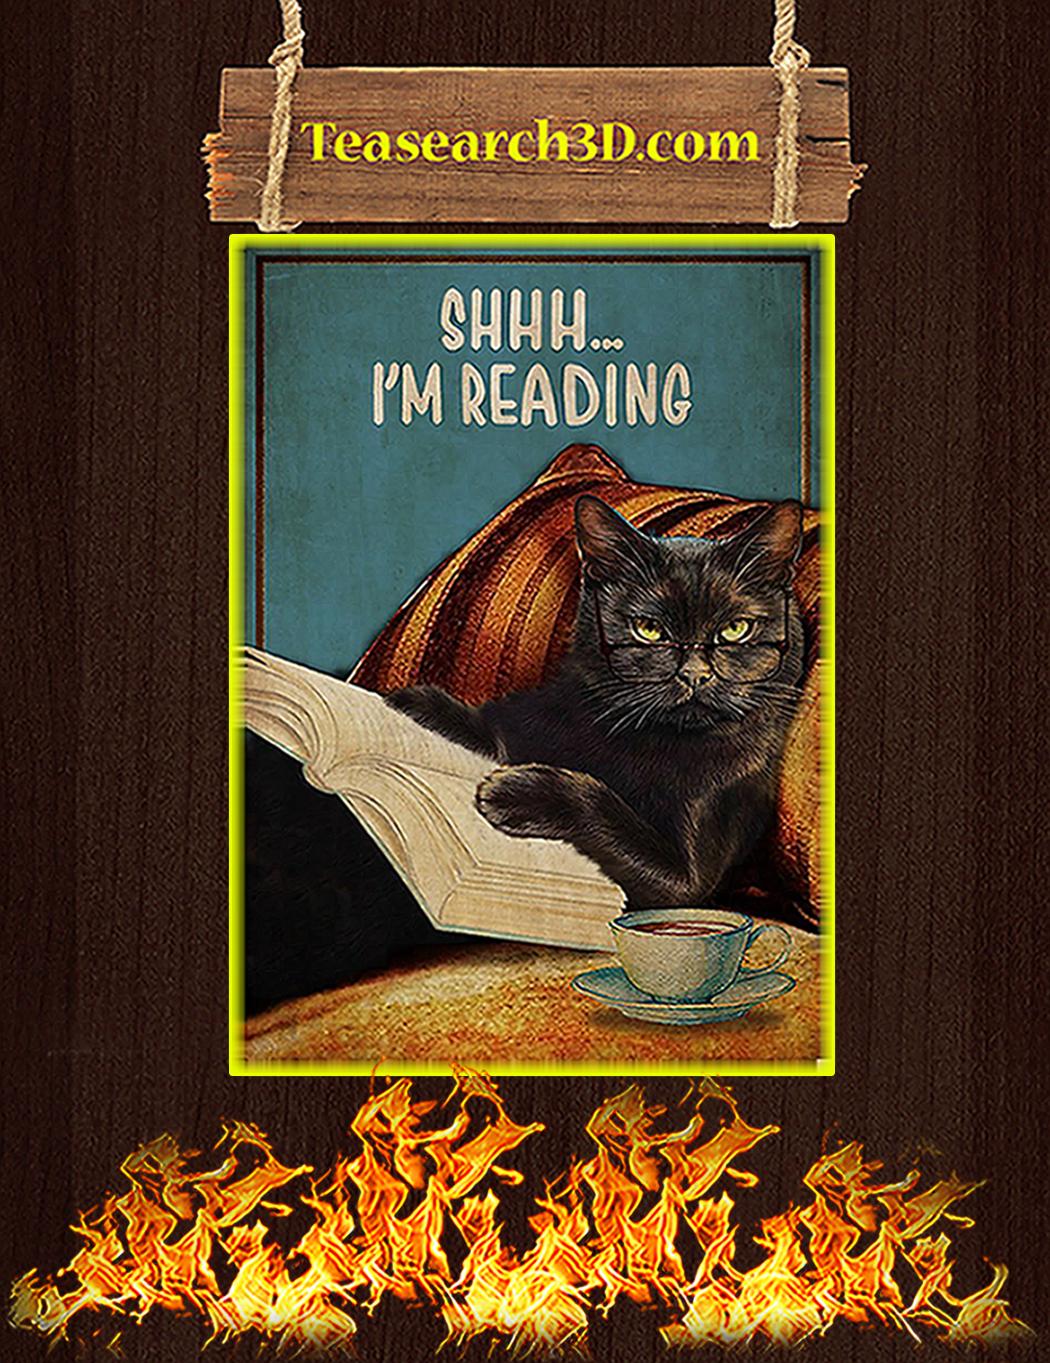 Black cat shhh I'm reading poster A1